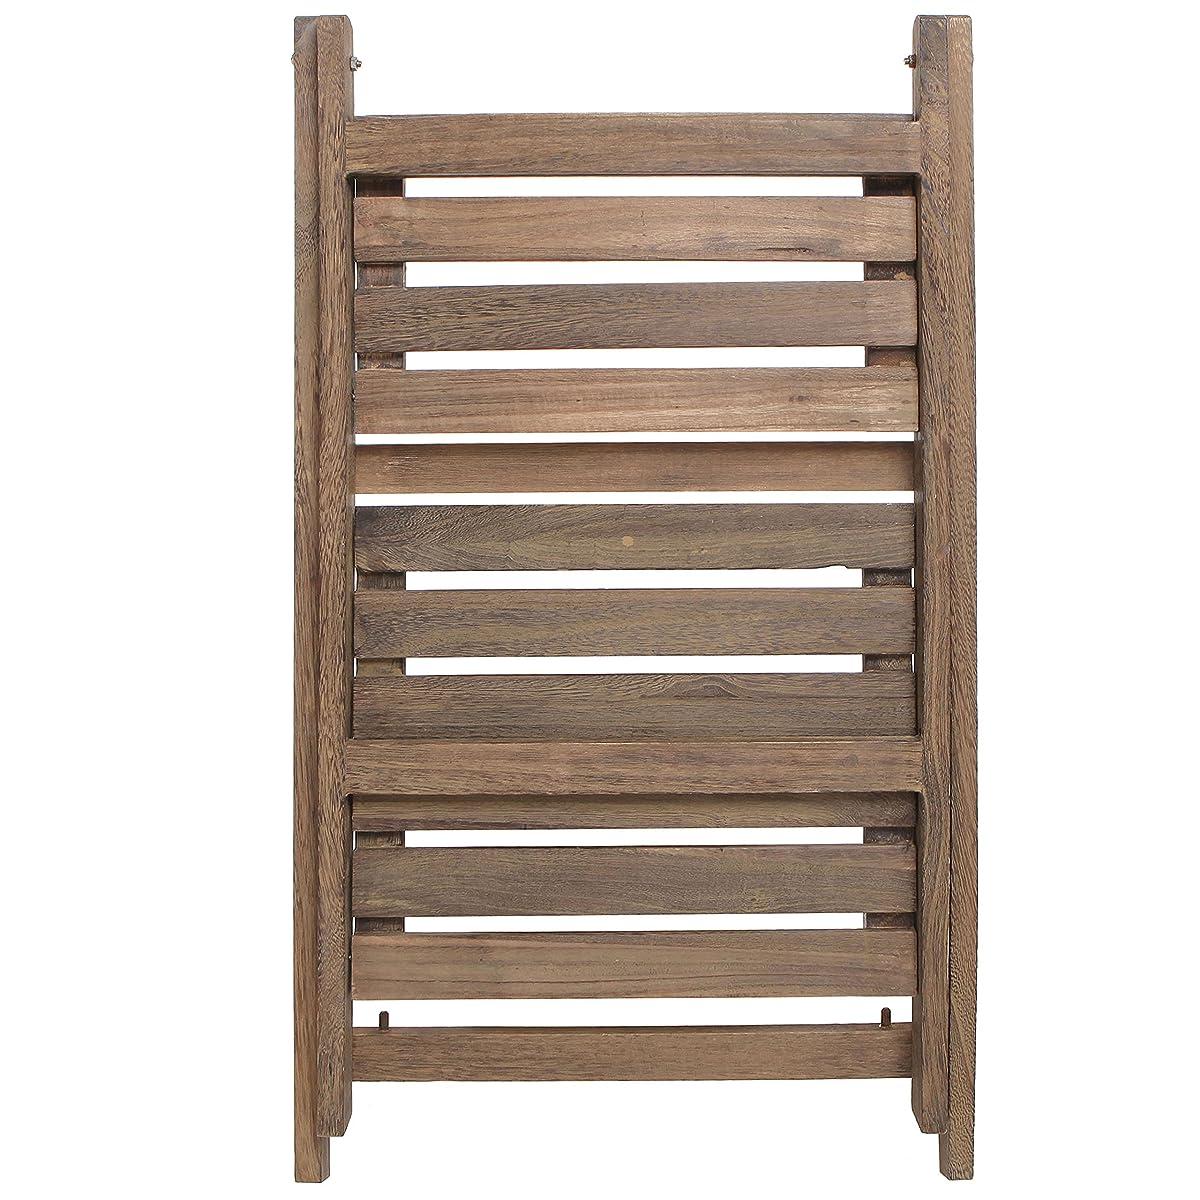 MyGift Rustic Brown Wood Design 2 Tier Freestanding Foldable Shelf Rack/Decorative Planter Pot Display Stand